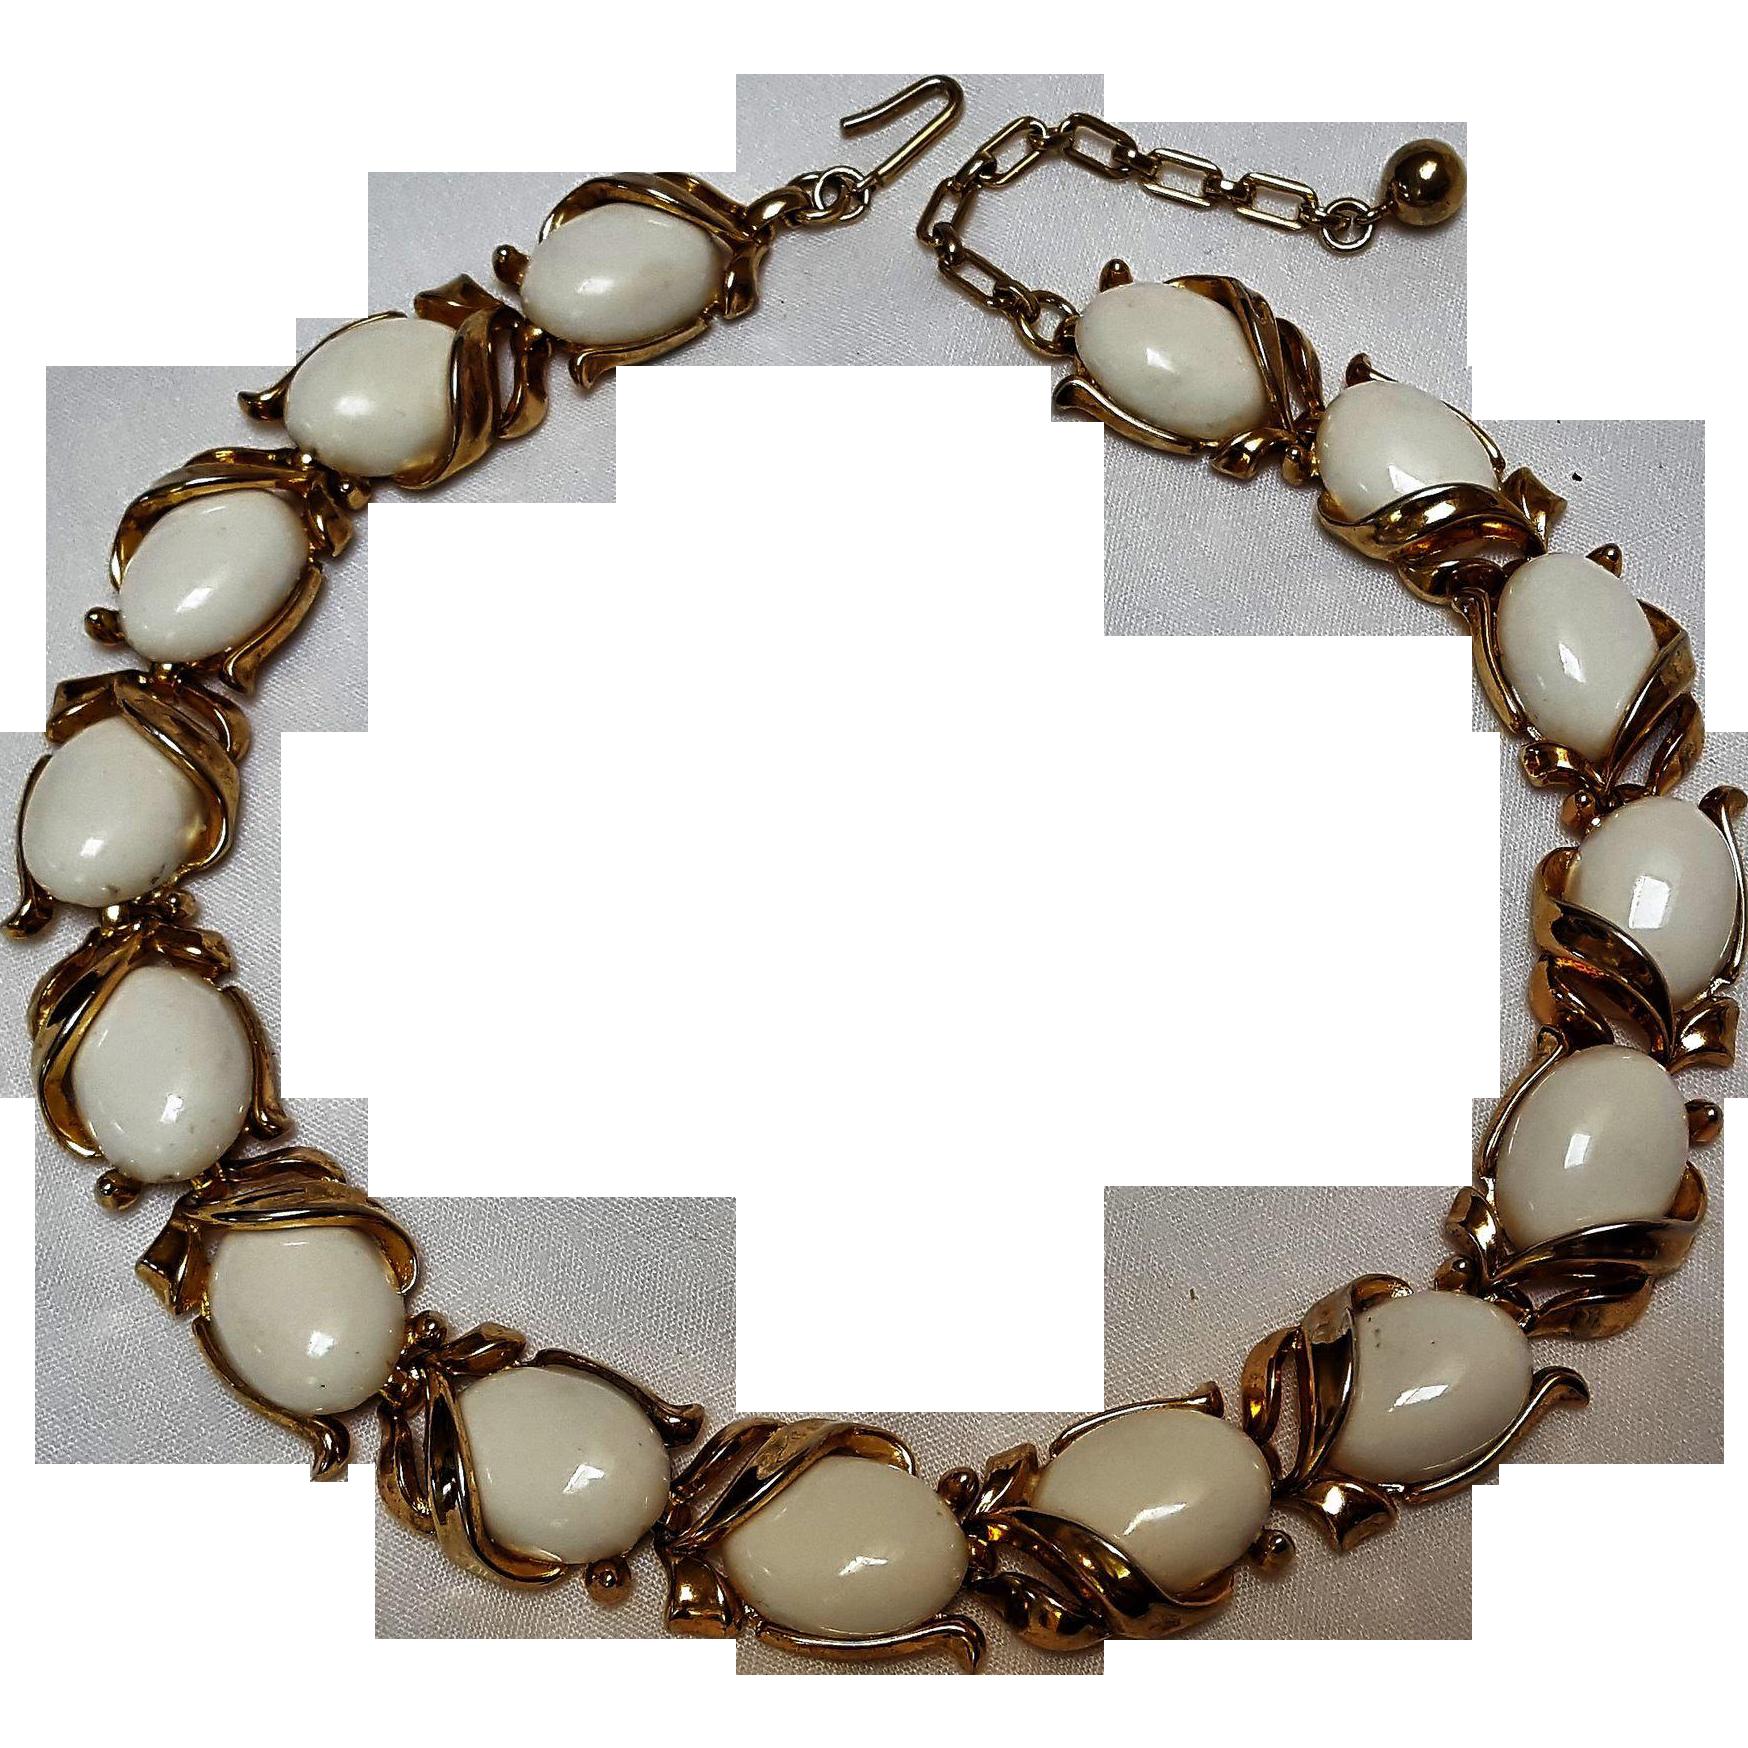 Trifari choker necklace white lucite cabochons